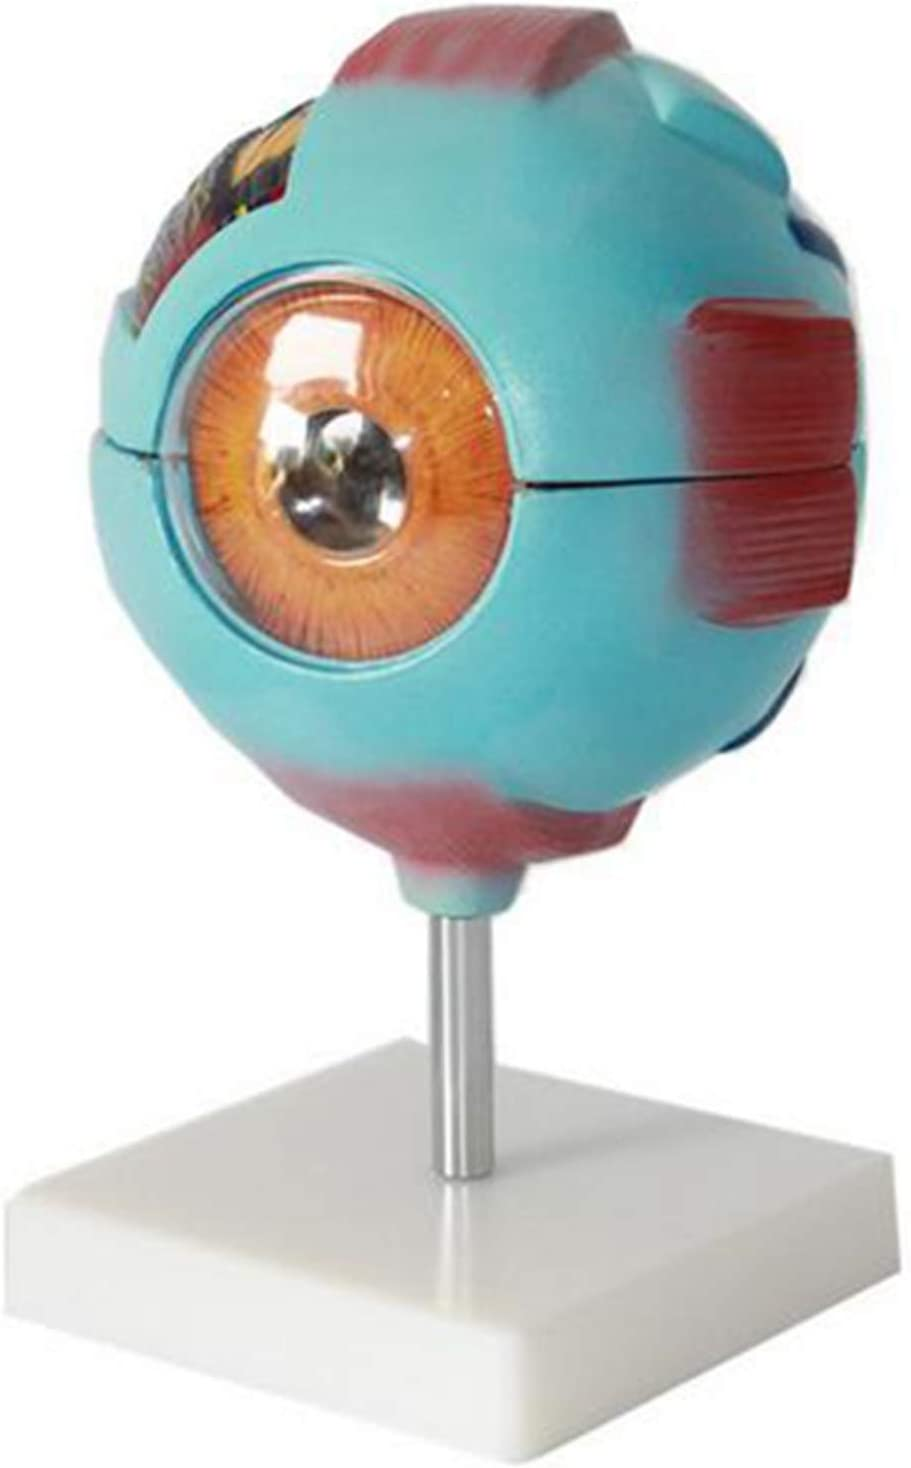 XYXZ Anatomy Model 6X Enlarged Eye Austin Mall Human Anatomical Mode OFFicial shop Anatom